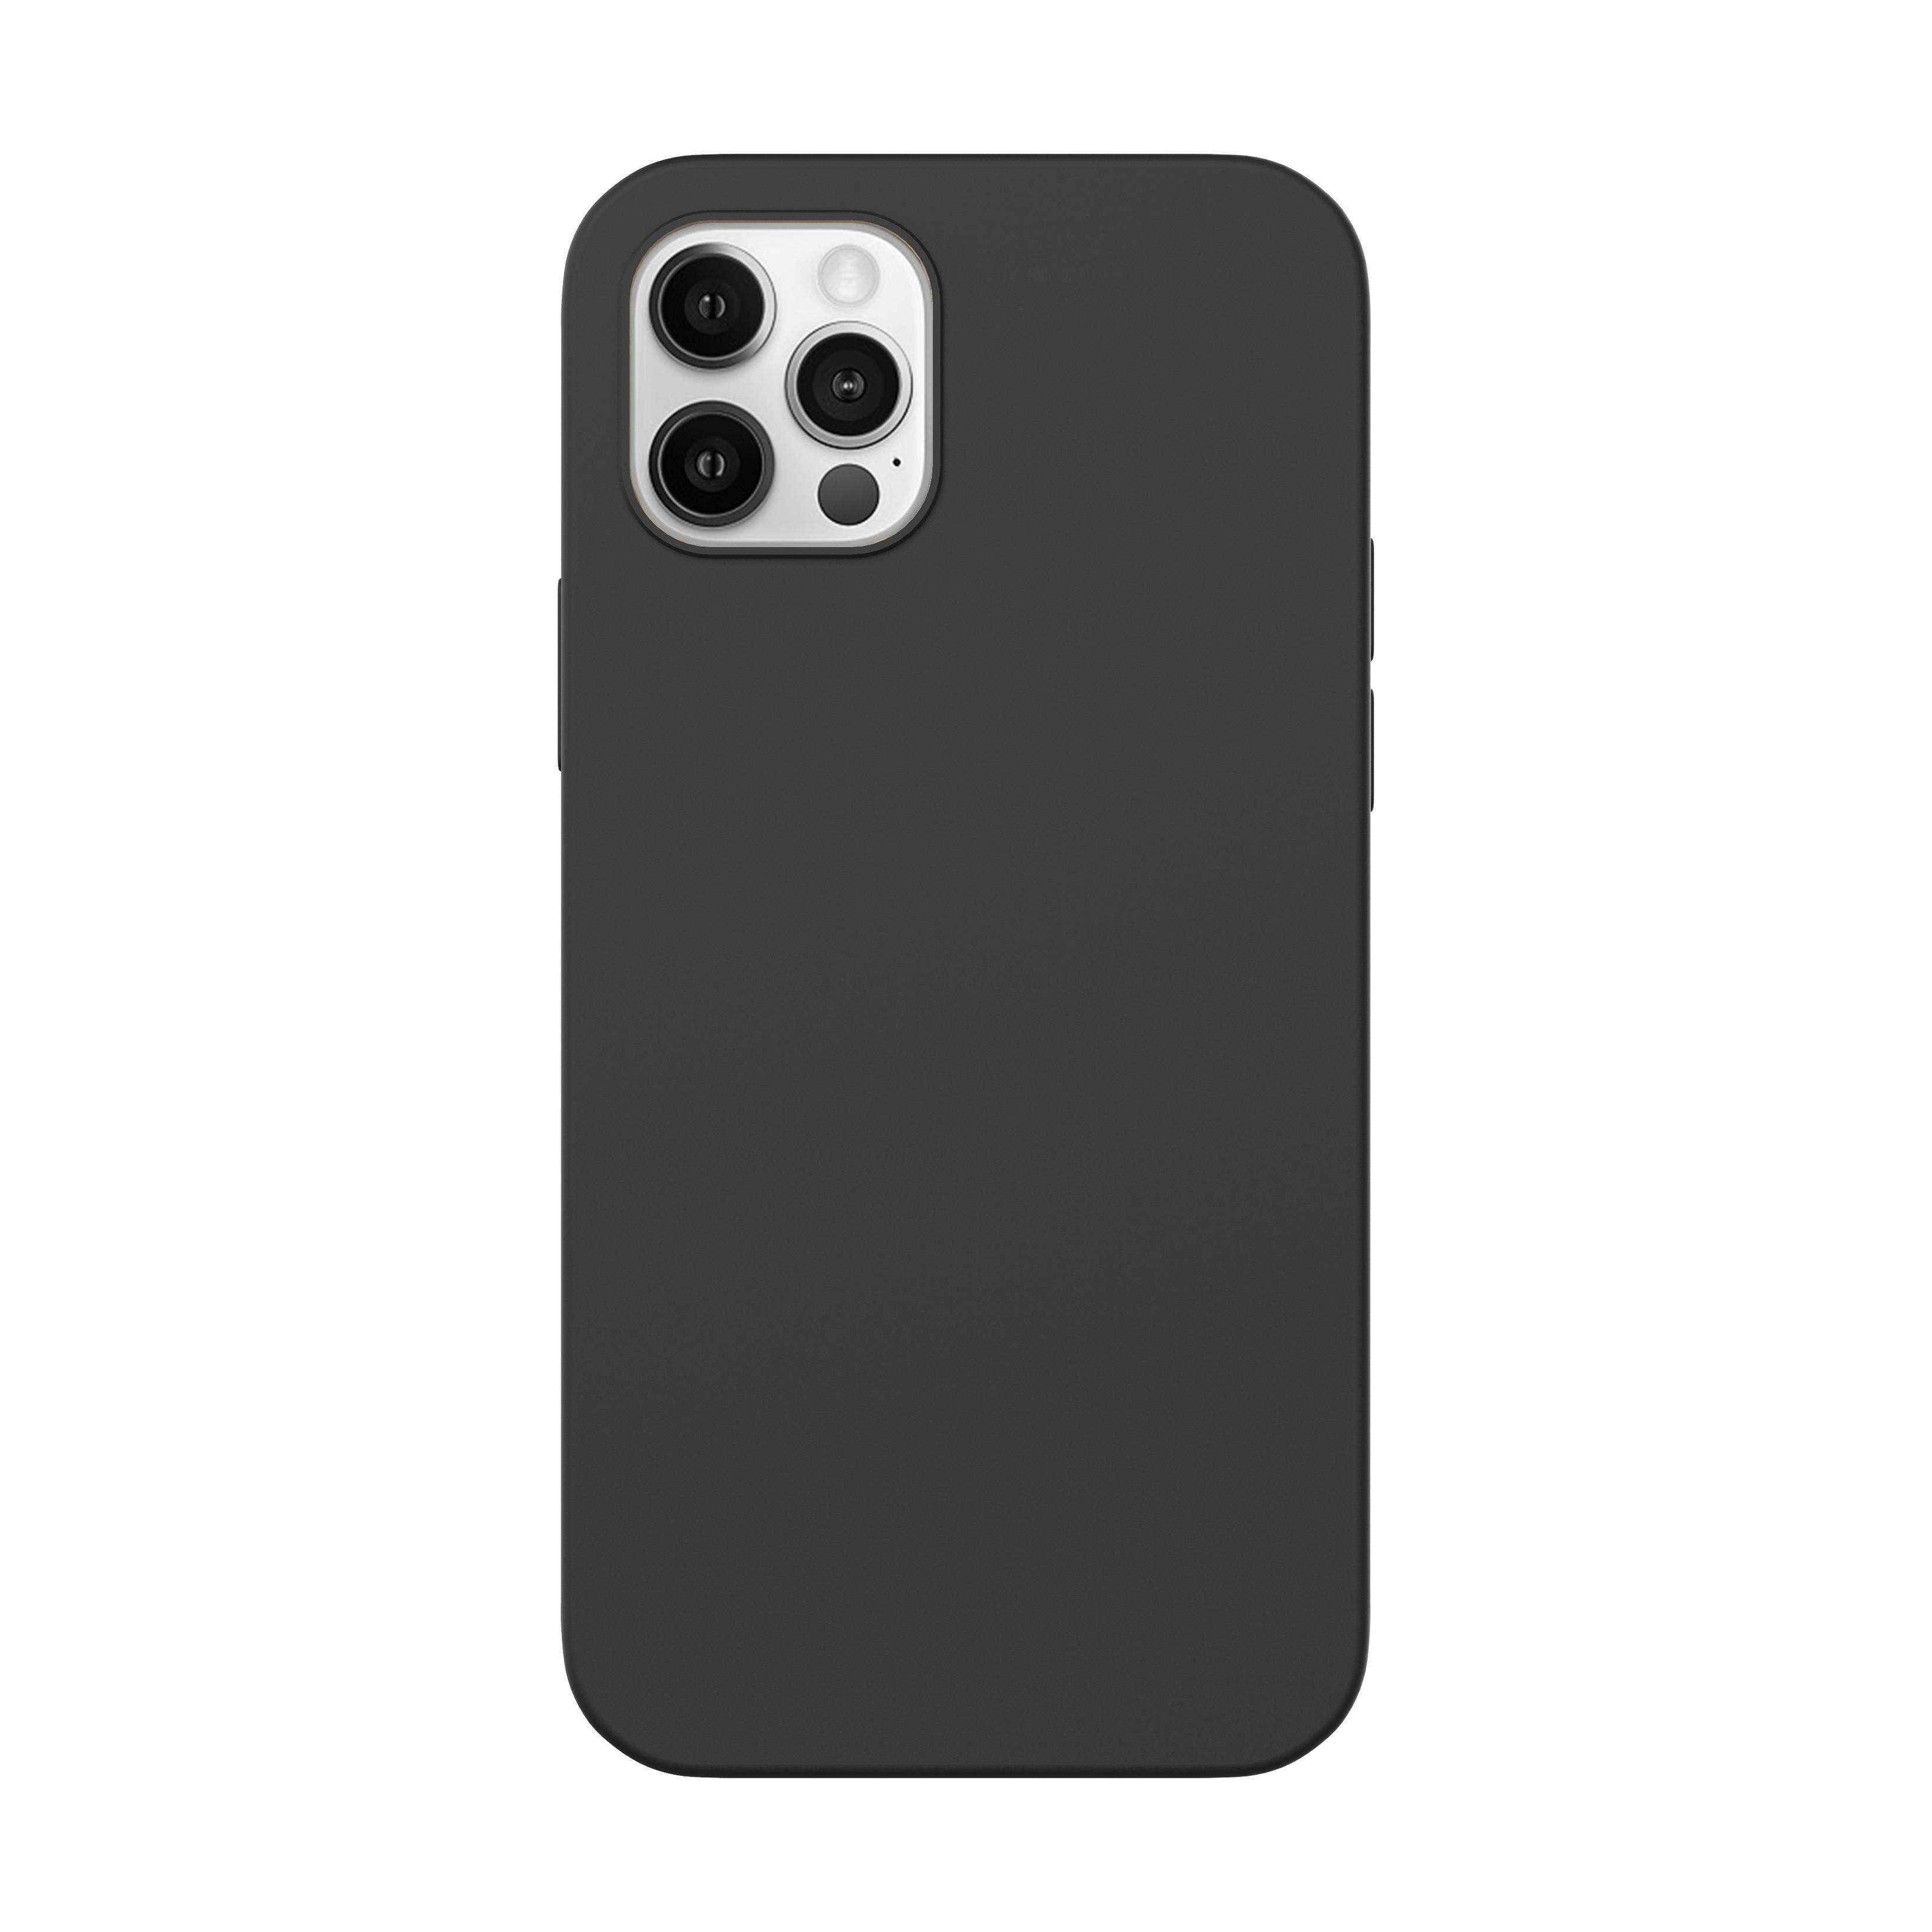 Capac protectie spate cellara din silicon colectia slim pentru iphone 12 pro max - negru